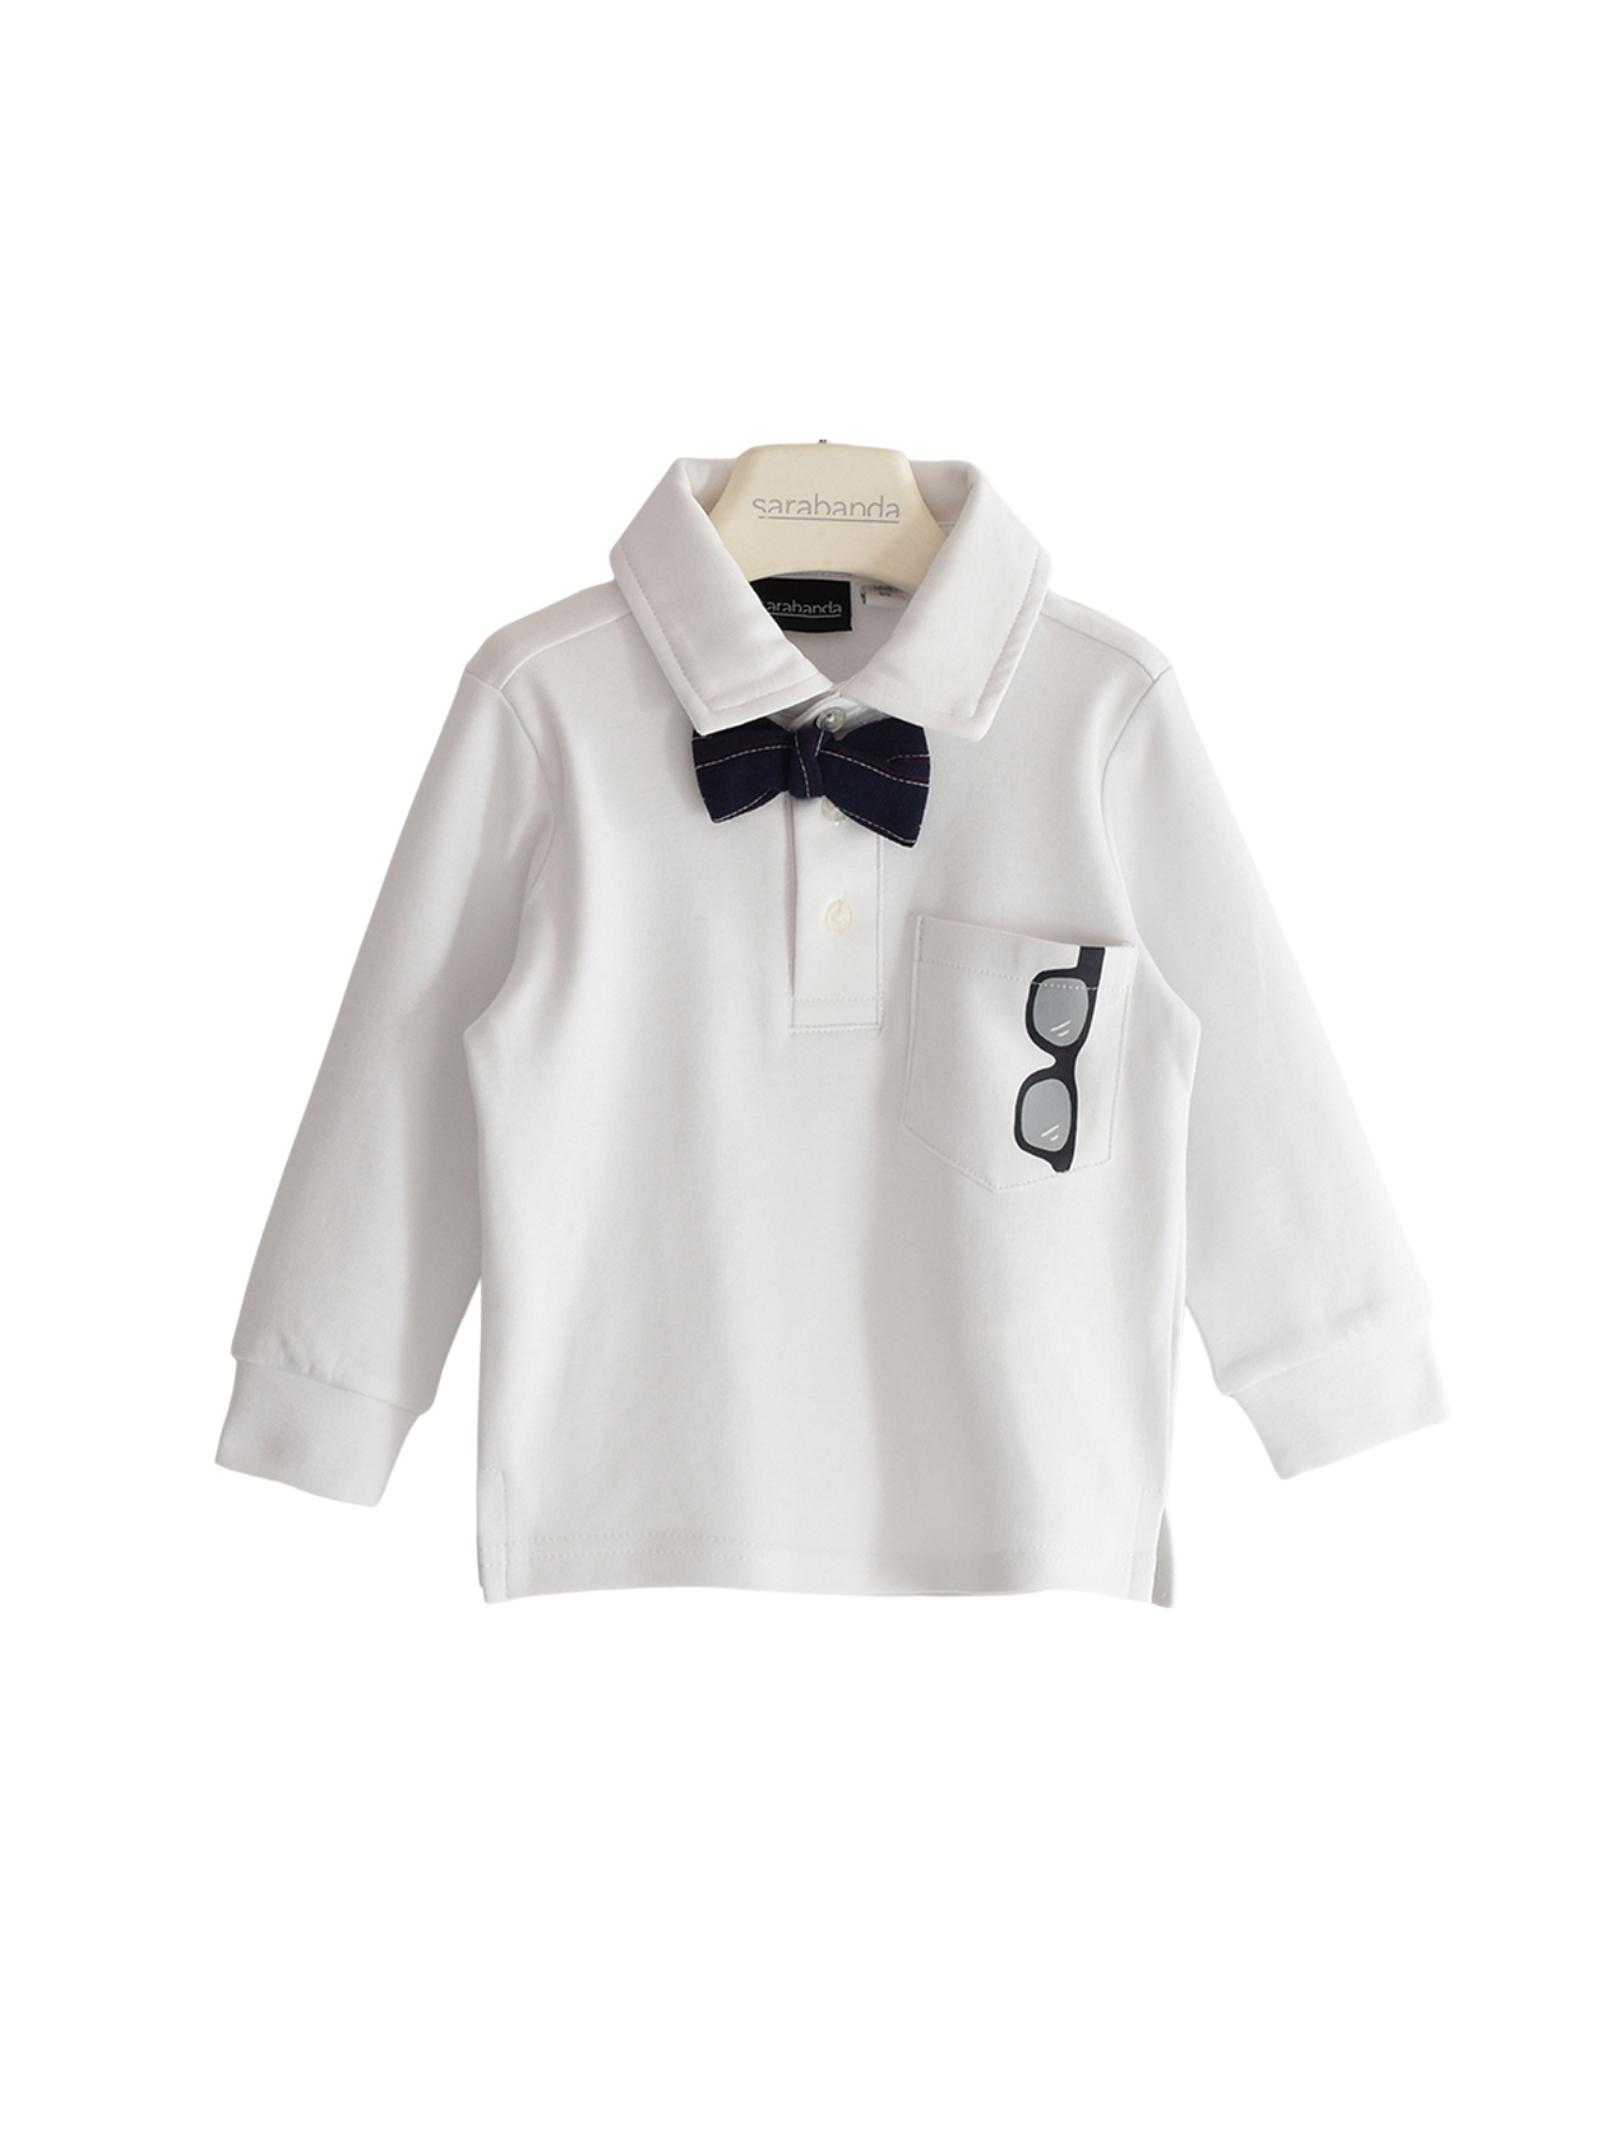 Elegant Polo Shirt For Boys SARABANDA | Polo | 03125000113